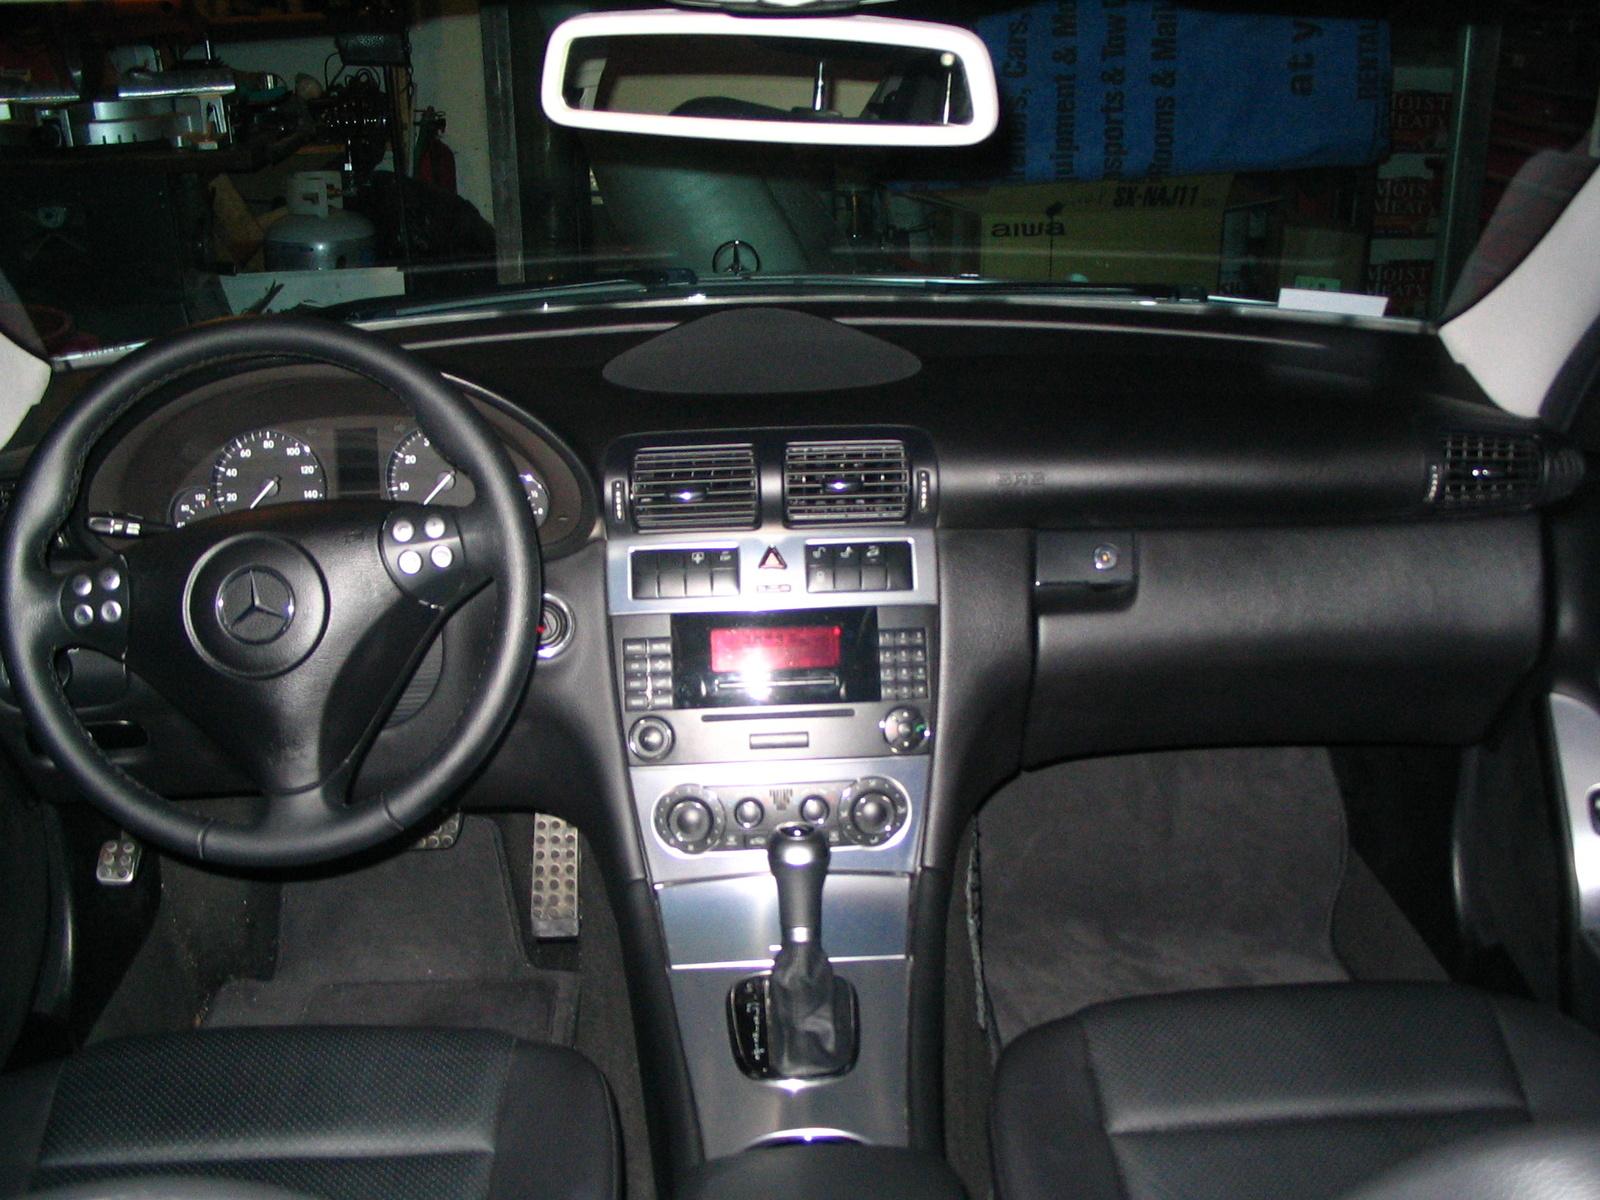 2005 Mercedes-benz C-class - Interior Pictures